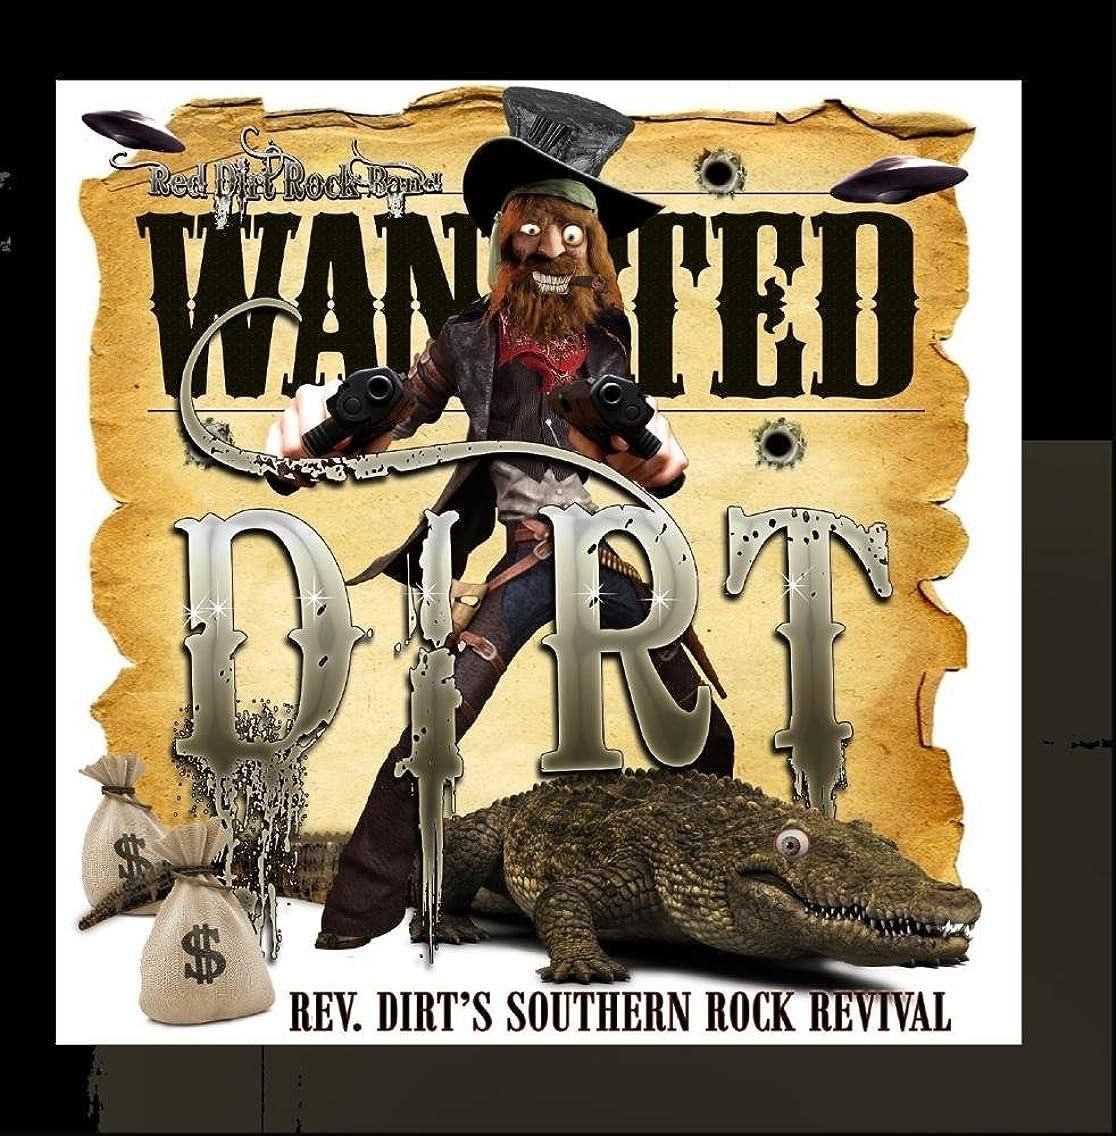 Rev. Dirts Southern Rock Revival